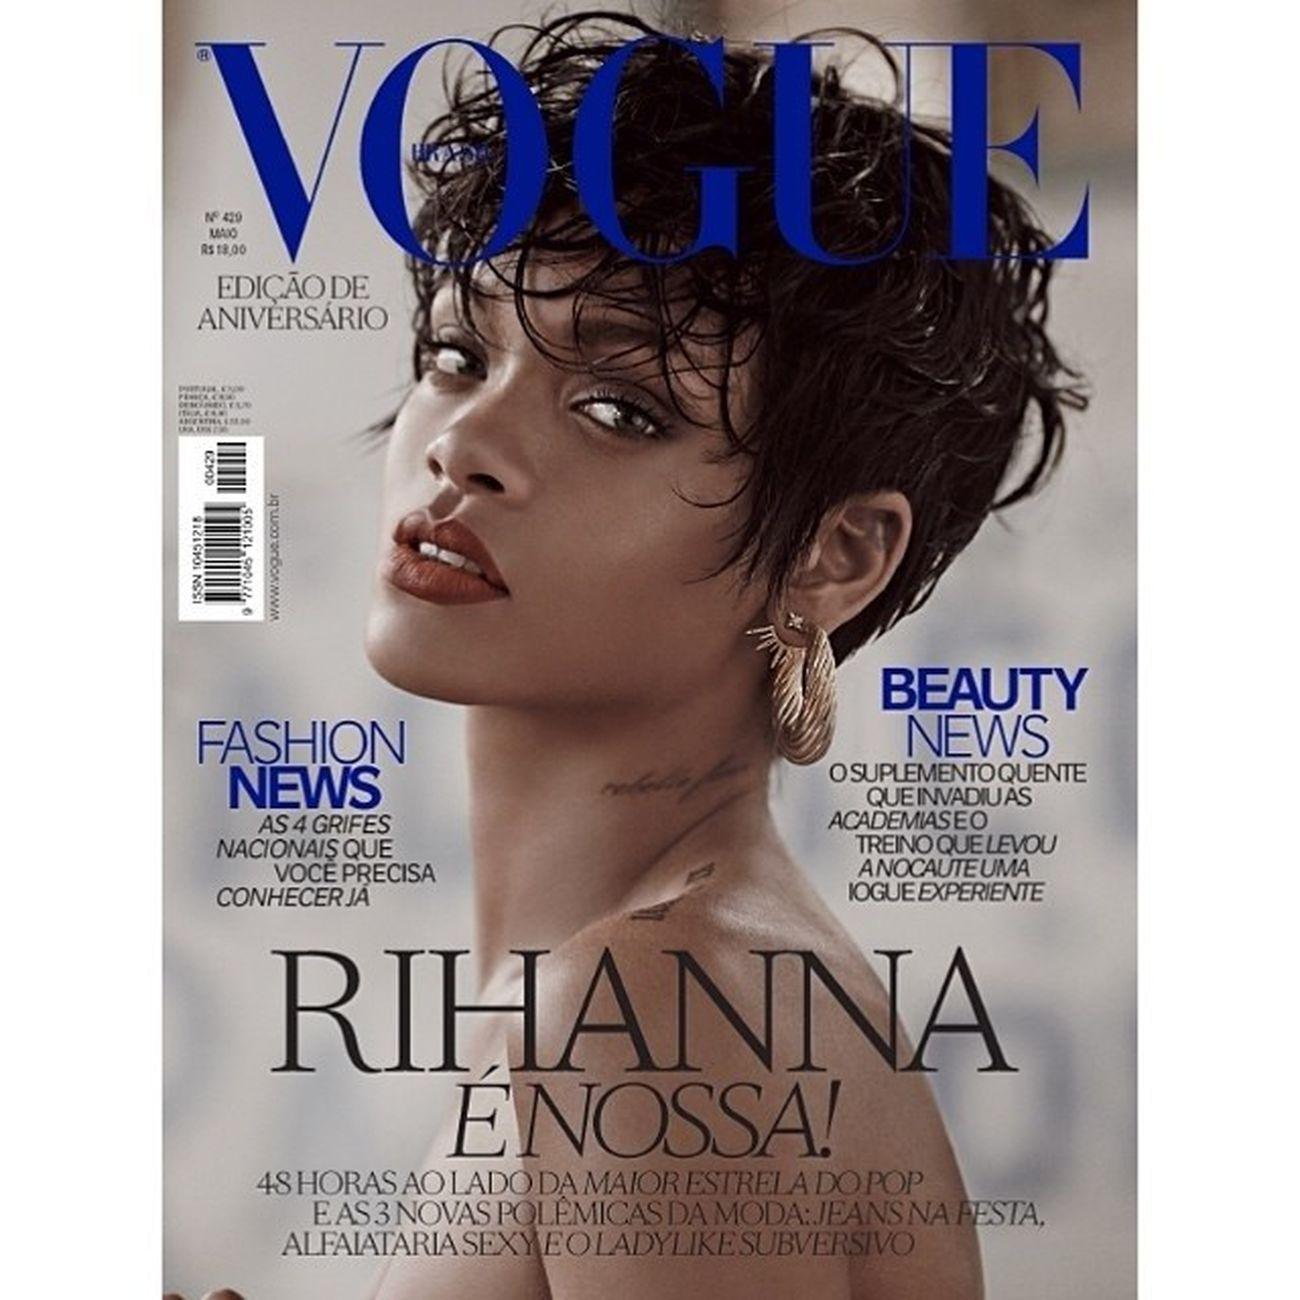 @Instag_app Rihanna Rockstar RIH Girl hot gorgeous badgalriri rihannanavy music pop talkthattalk fame badass beautiful riri beauty star fan singer famous artist cute flawless tune